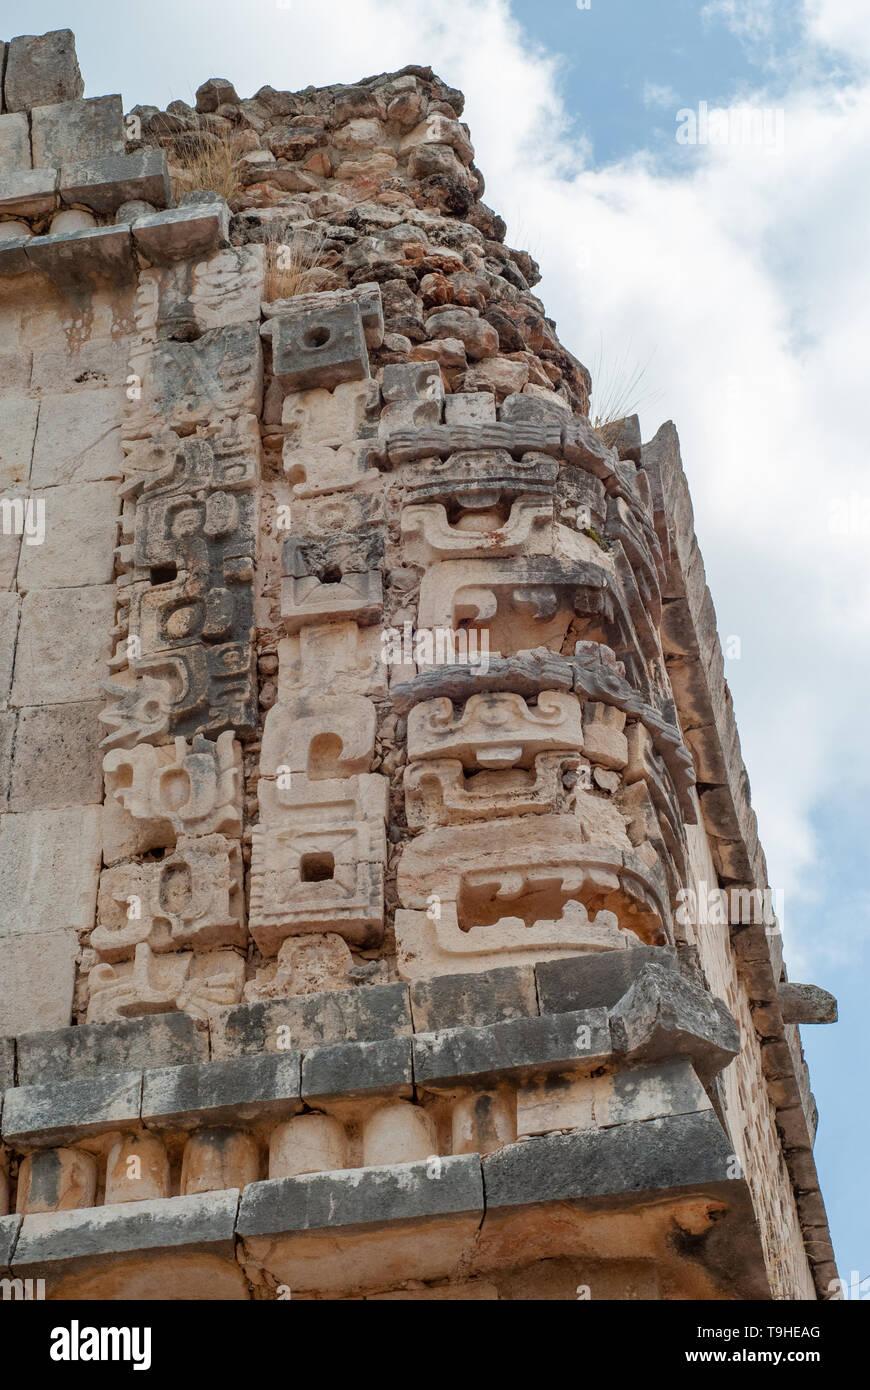 Ornamental sculptures of a Mayan temple, of the Ek Balam archaeological area, in the Yucatan peninsula - Stock Image